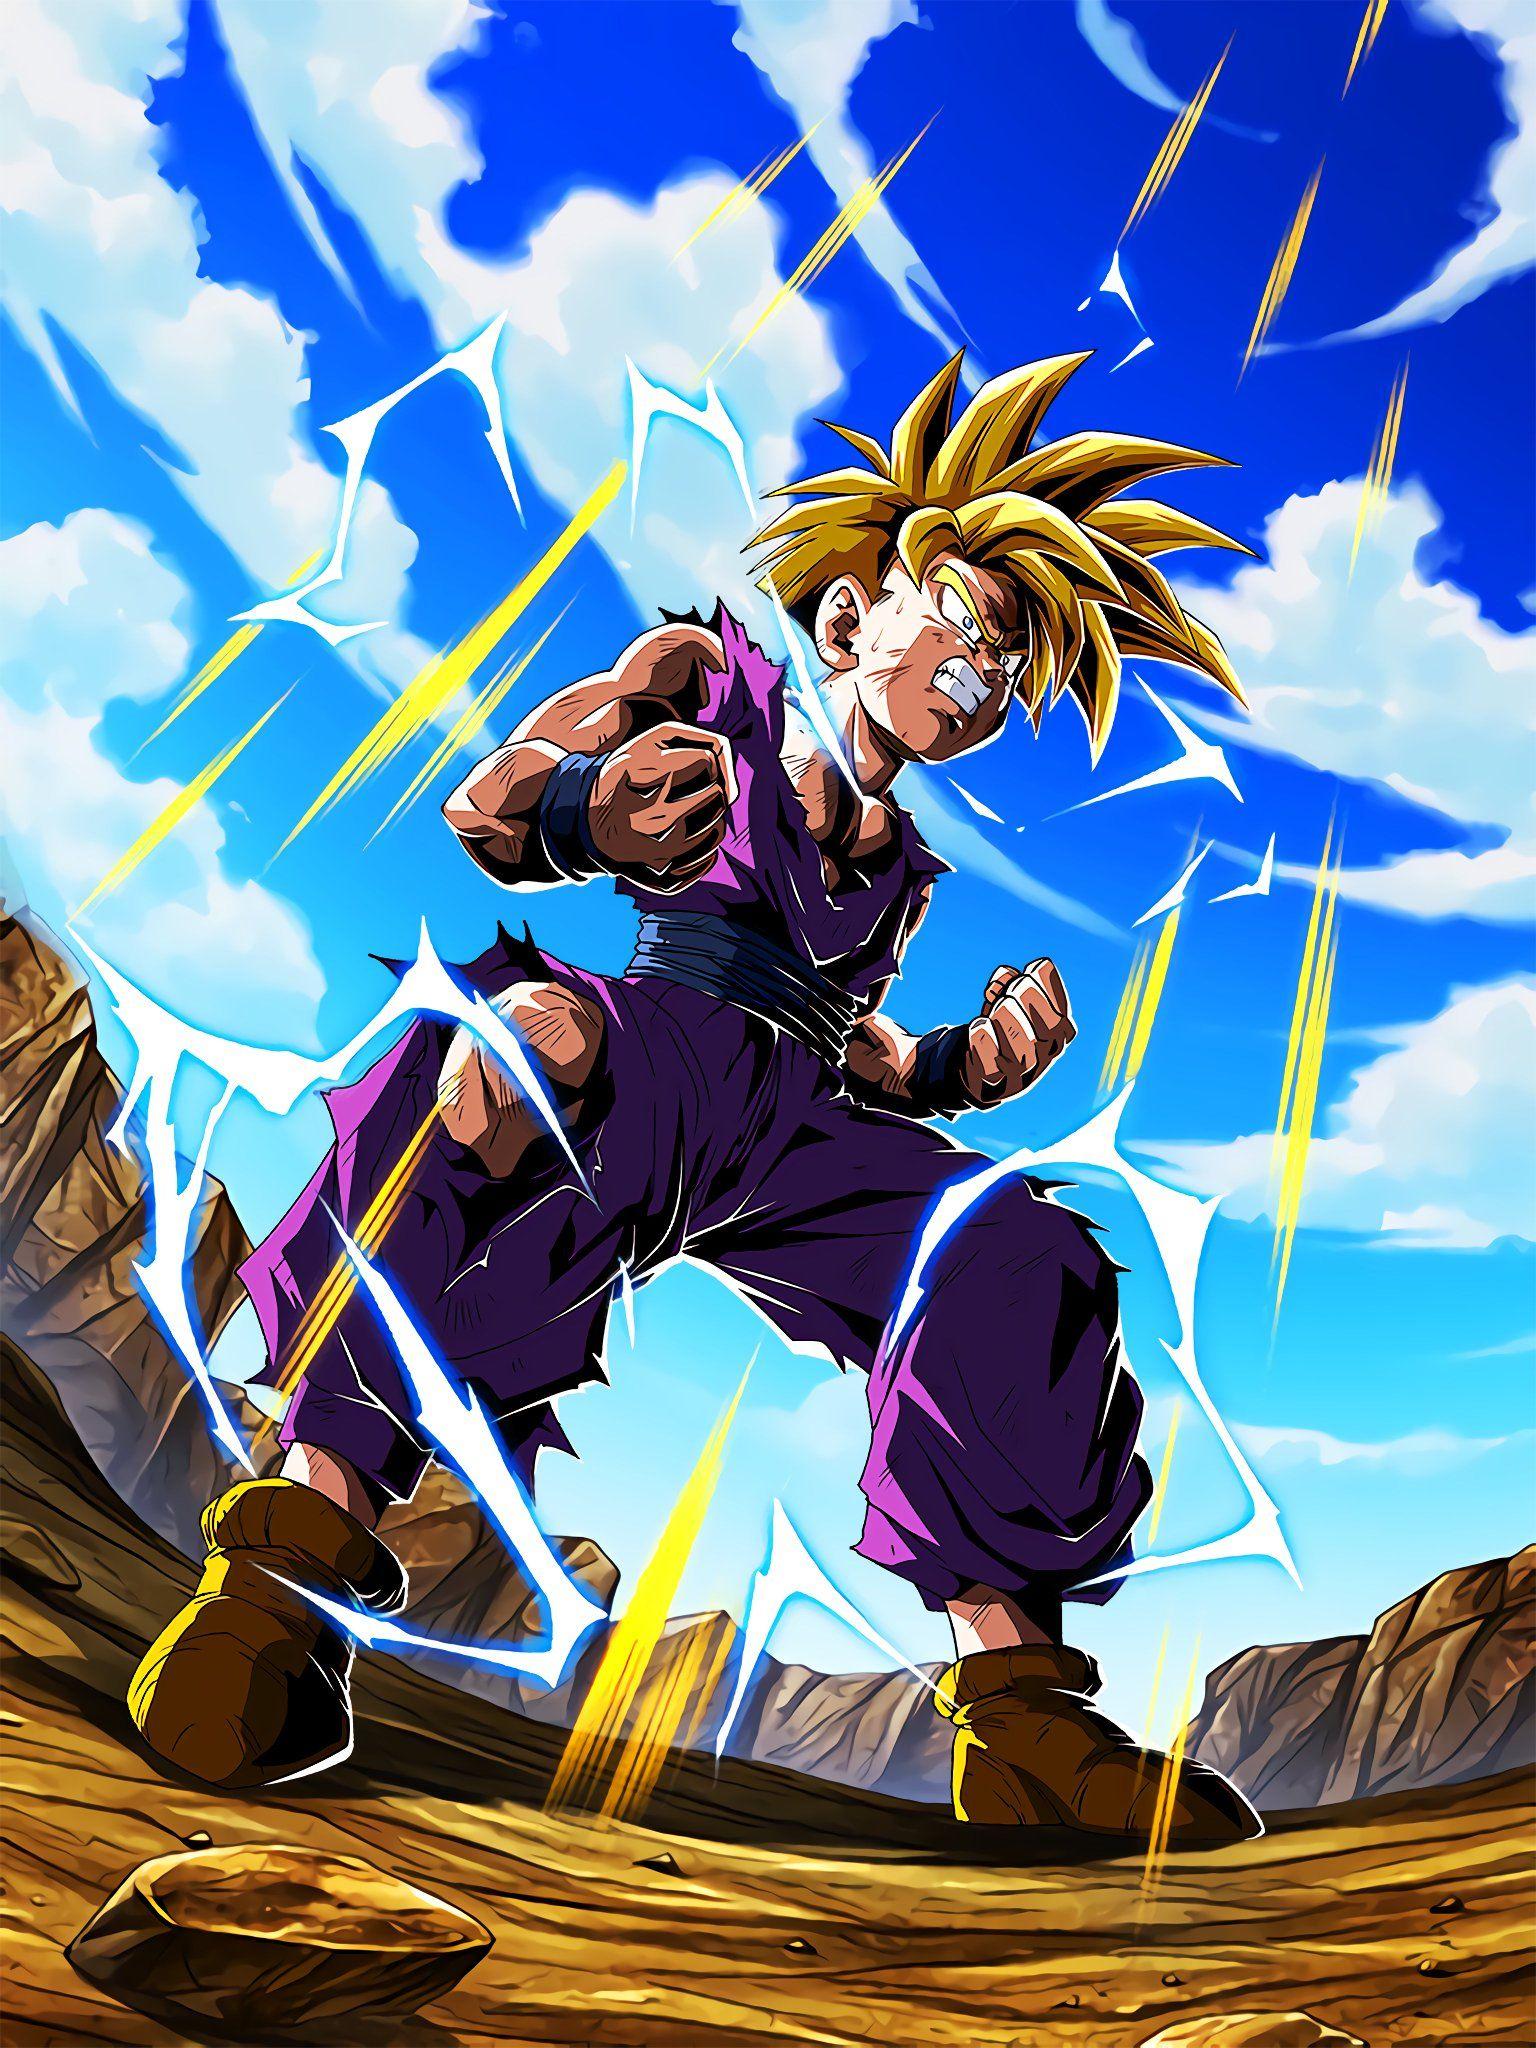 Hydros On Twitter Dragon Ball Super Goku Dragon Ball Goku Anime Dragon Ball Super